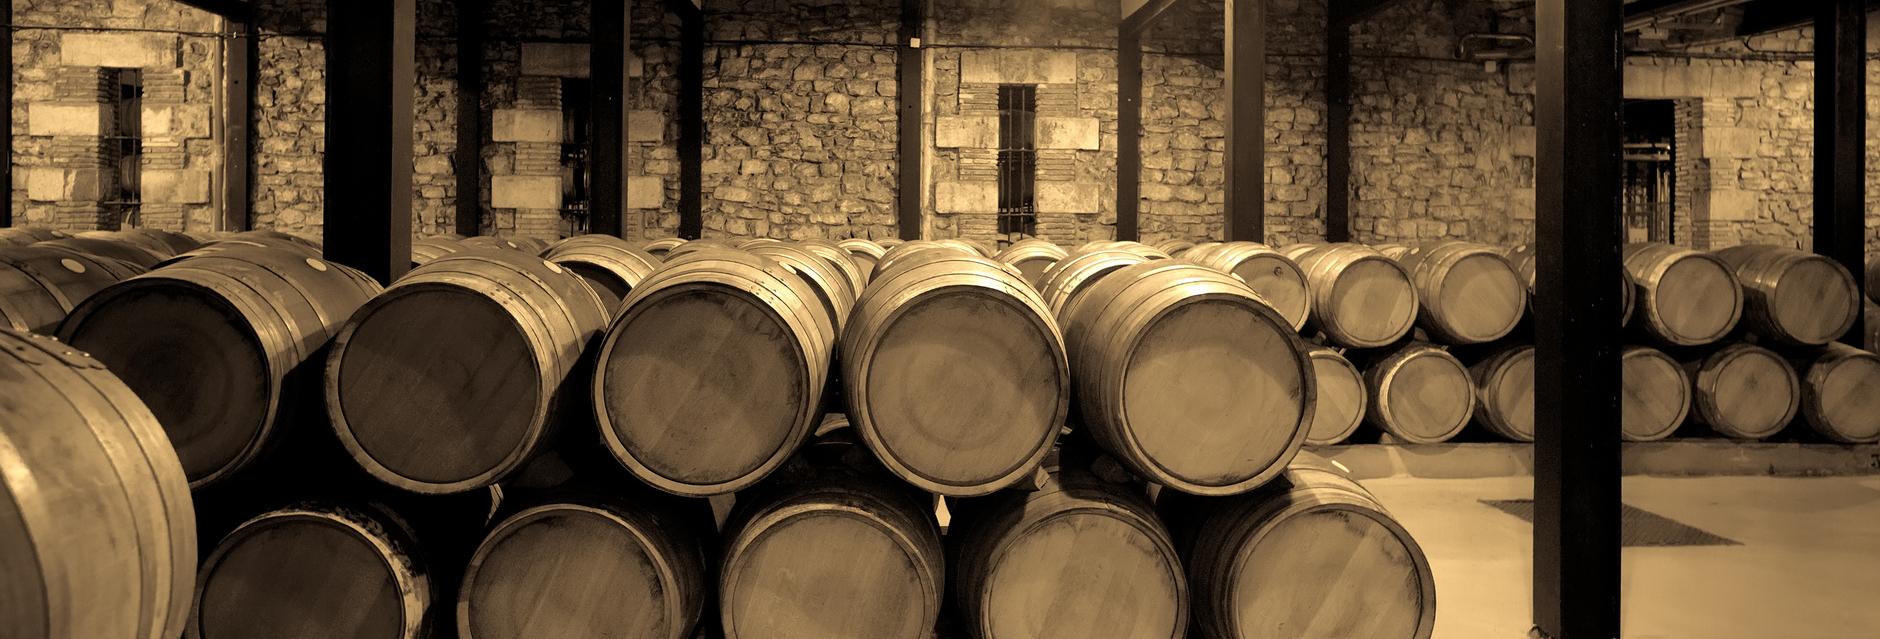 Aged photo of wine cellar